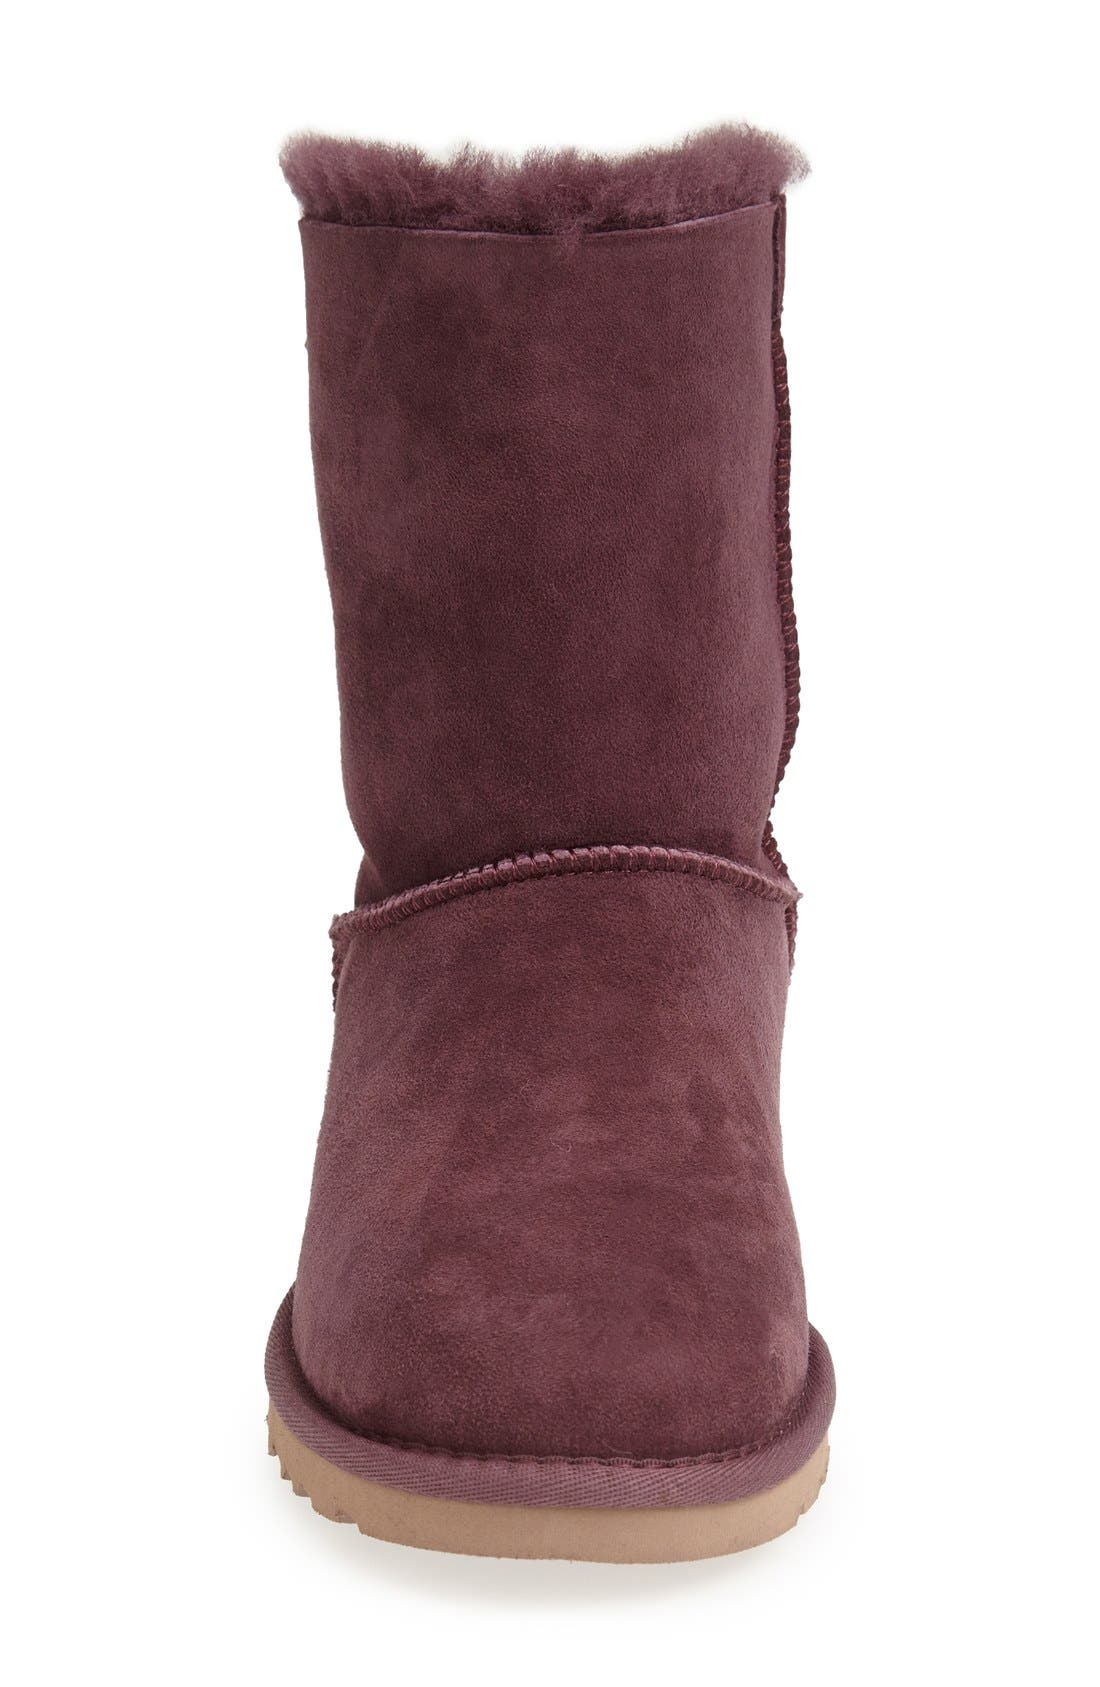 Alternate Image 3  - UGG® Australia 'Bailey Bow Corduroy' Boot (Women)